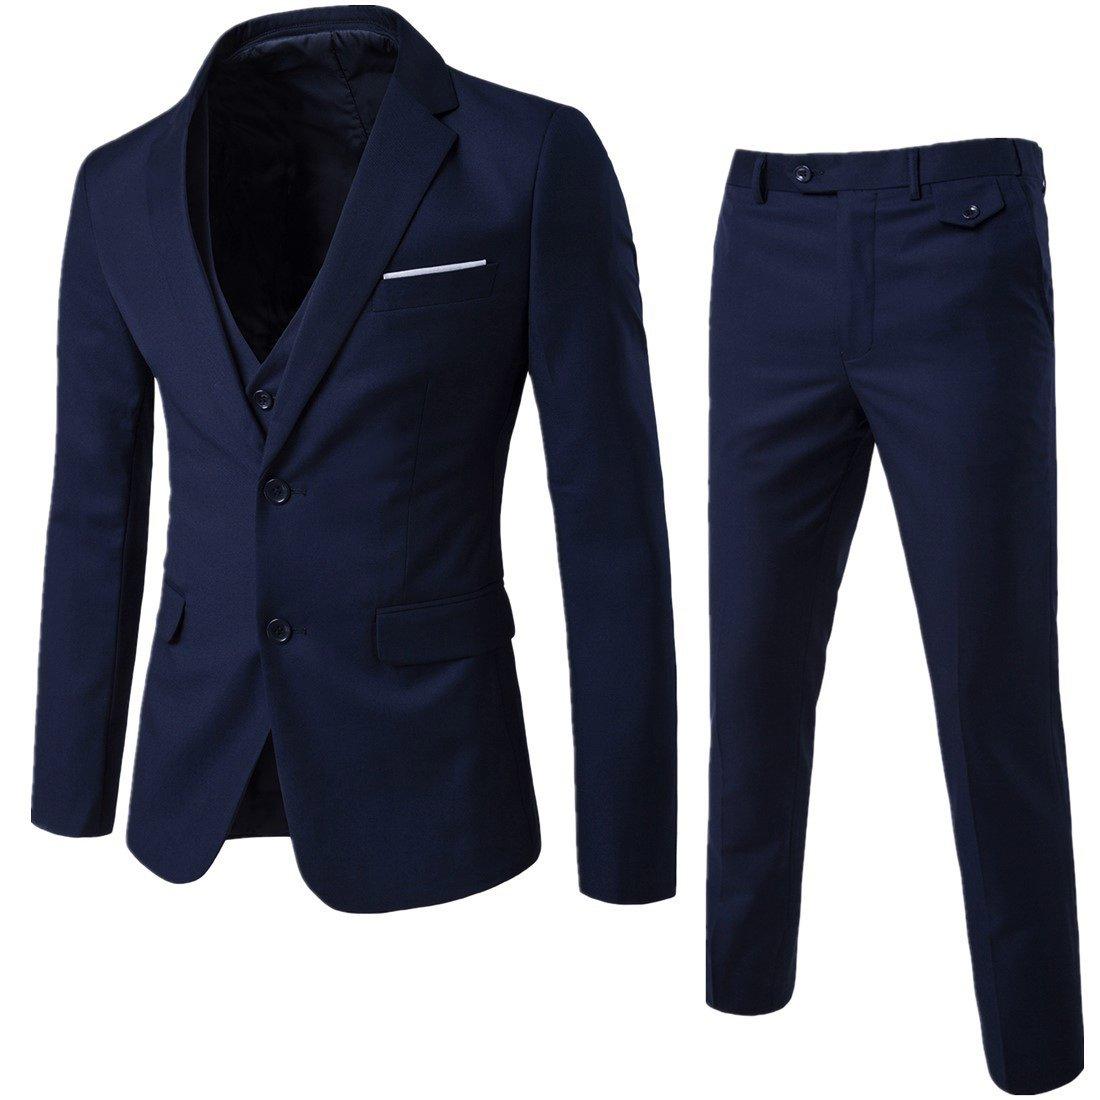 WEEN CHARM Mens Two Button Notch Lapel Slim Fit 3-piece Suit Blazer Jacket Tux Vest & Trousers Set,Navy,Medium by WEEN CHARM